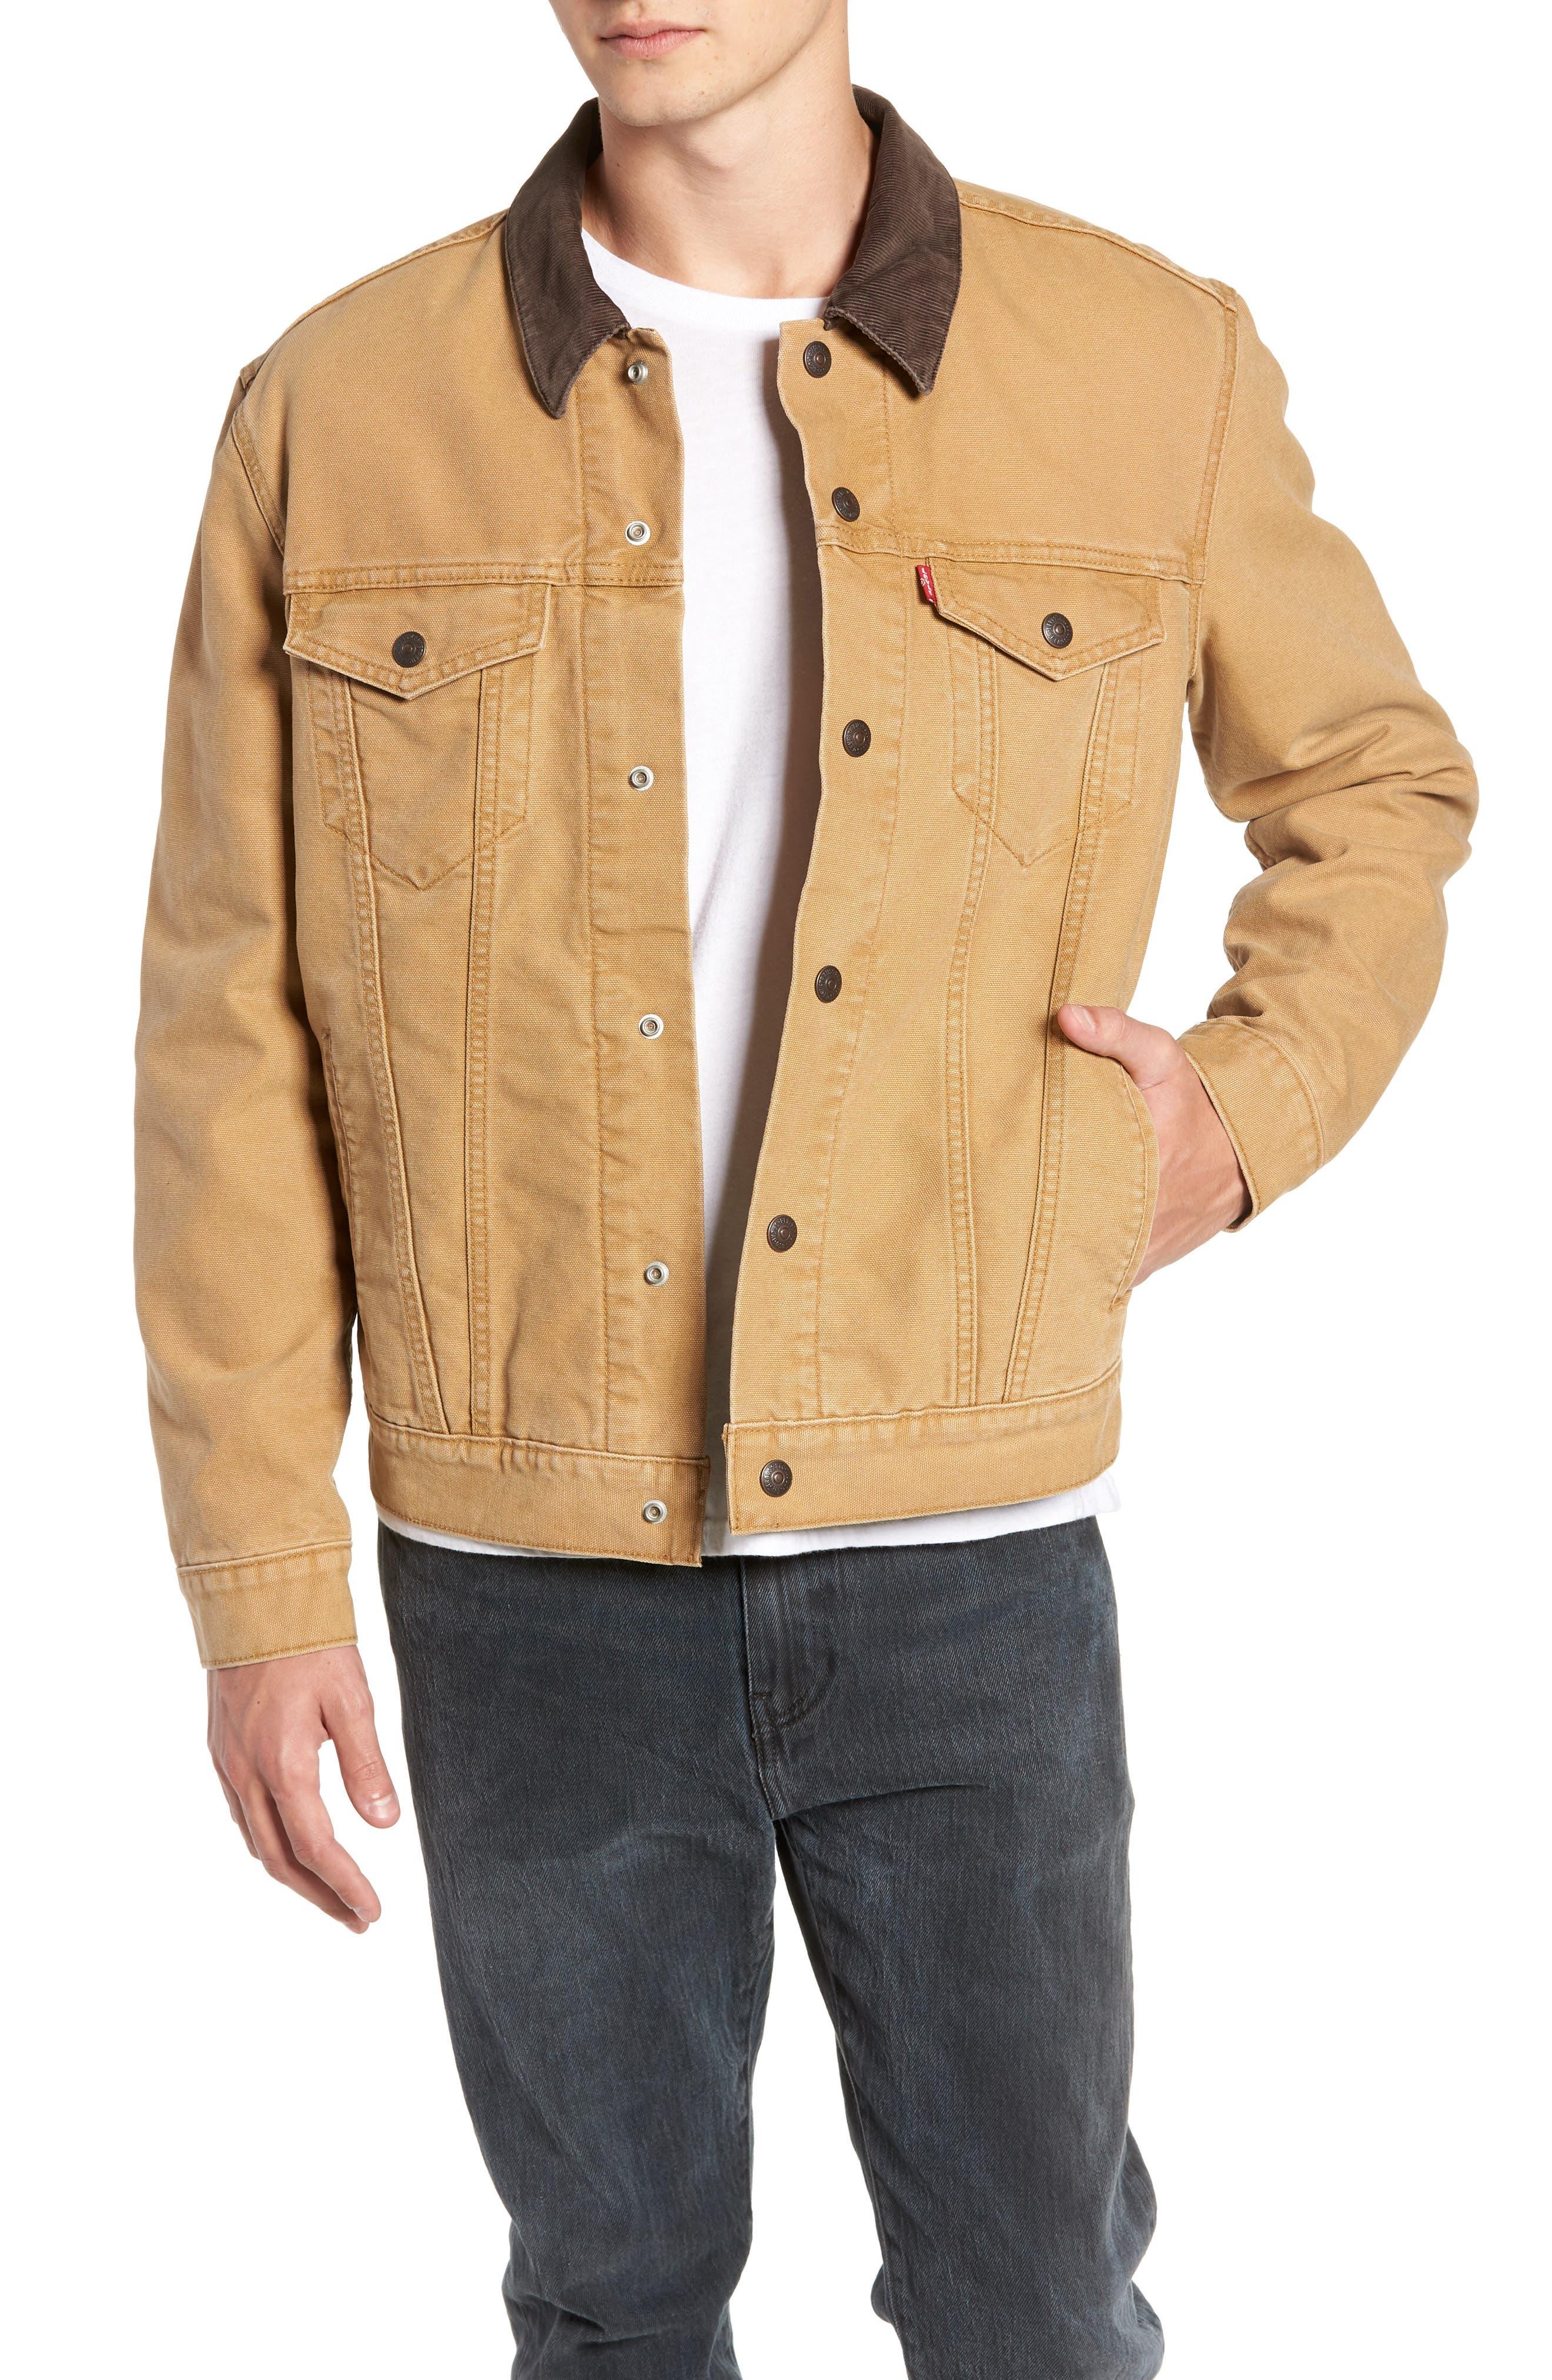 x Justin Timberlake Canvas Trucker Jacket,                             Main thumbnail 1, color,                             DIJON